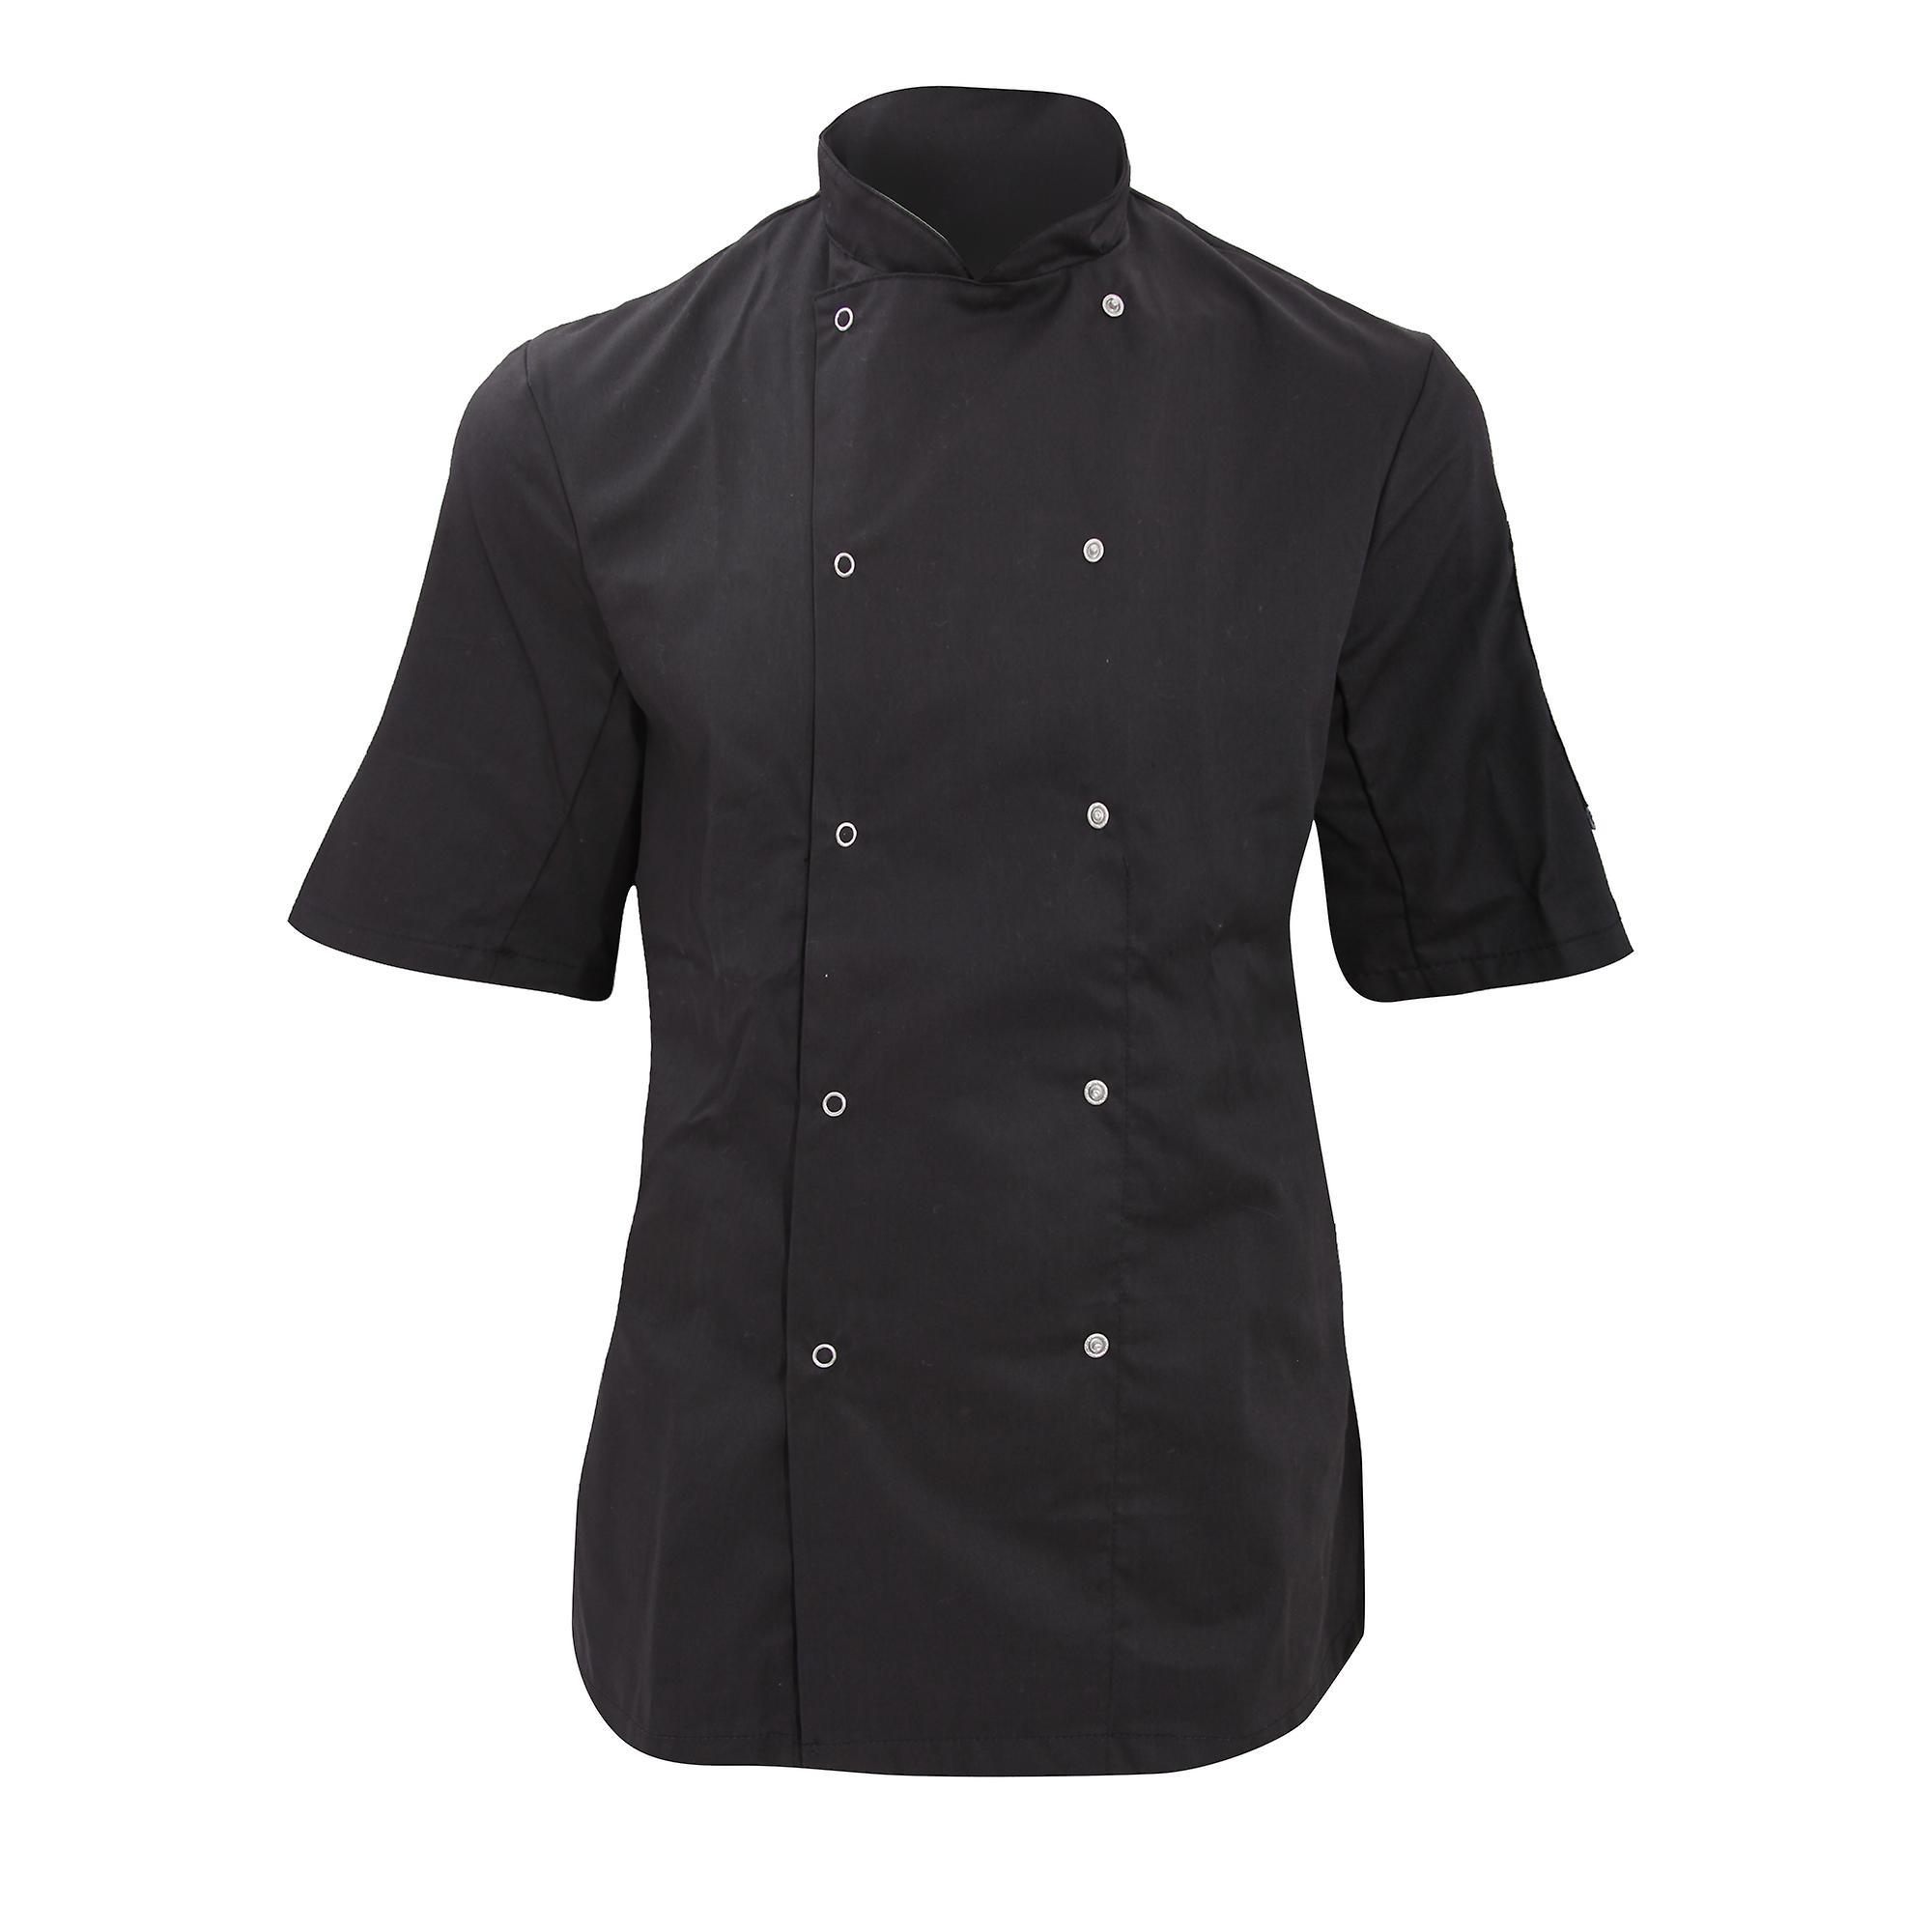 Dennys Womens/Ladies Economy Short Sleeve Chefs Jacket / Chefswear (Pack of 2)